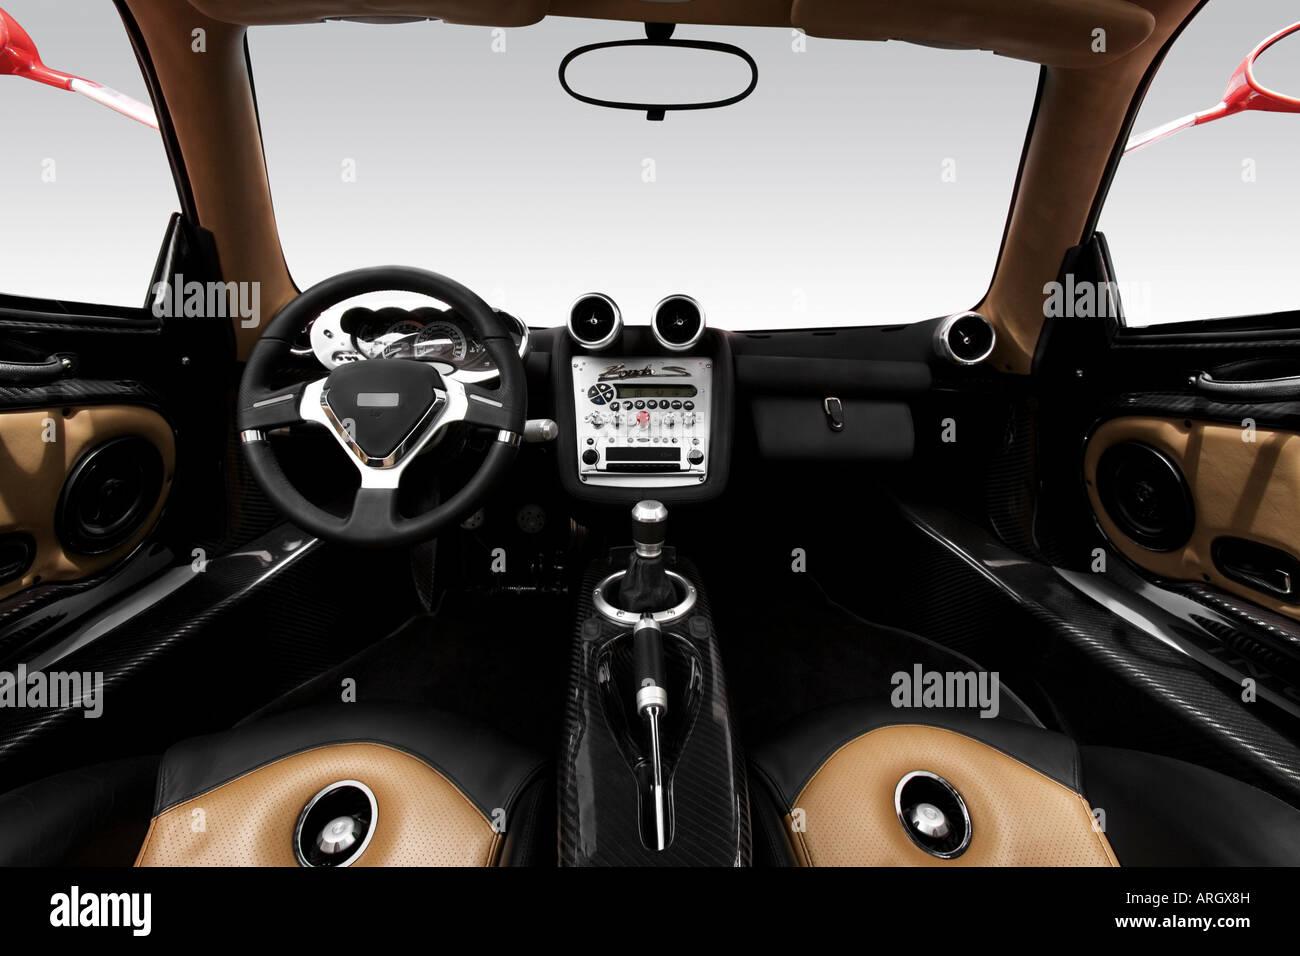 2001 Pagani Zonda S in Red - Dashboard, center console, gear shifter